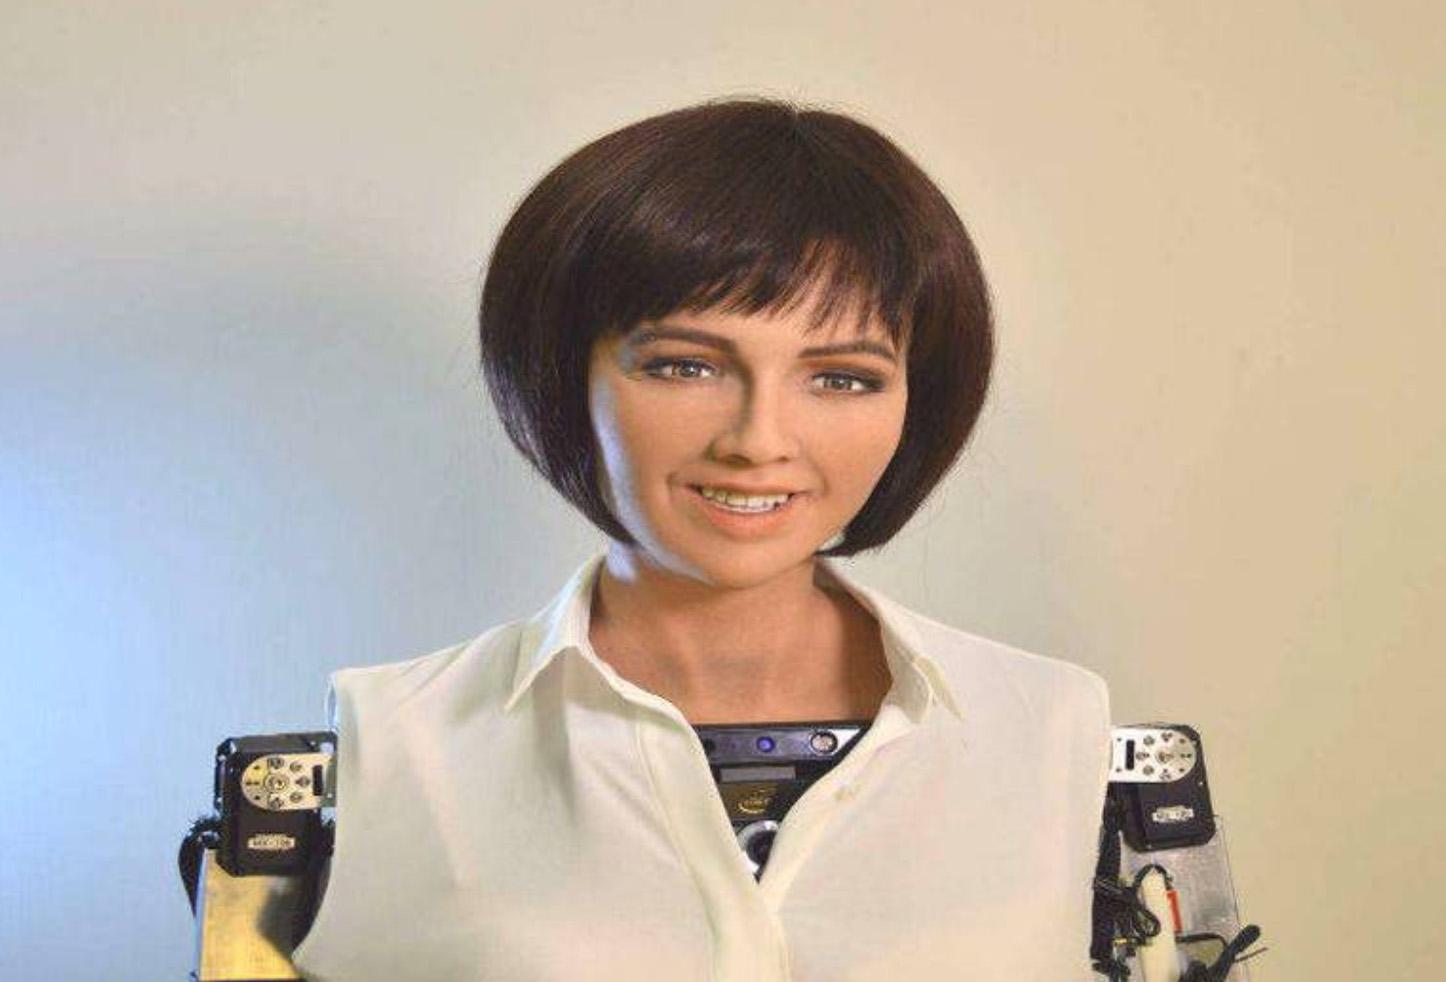 apocalipsis - robot